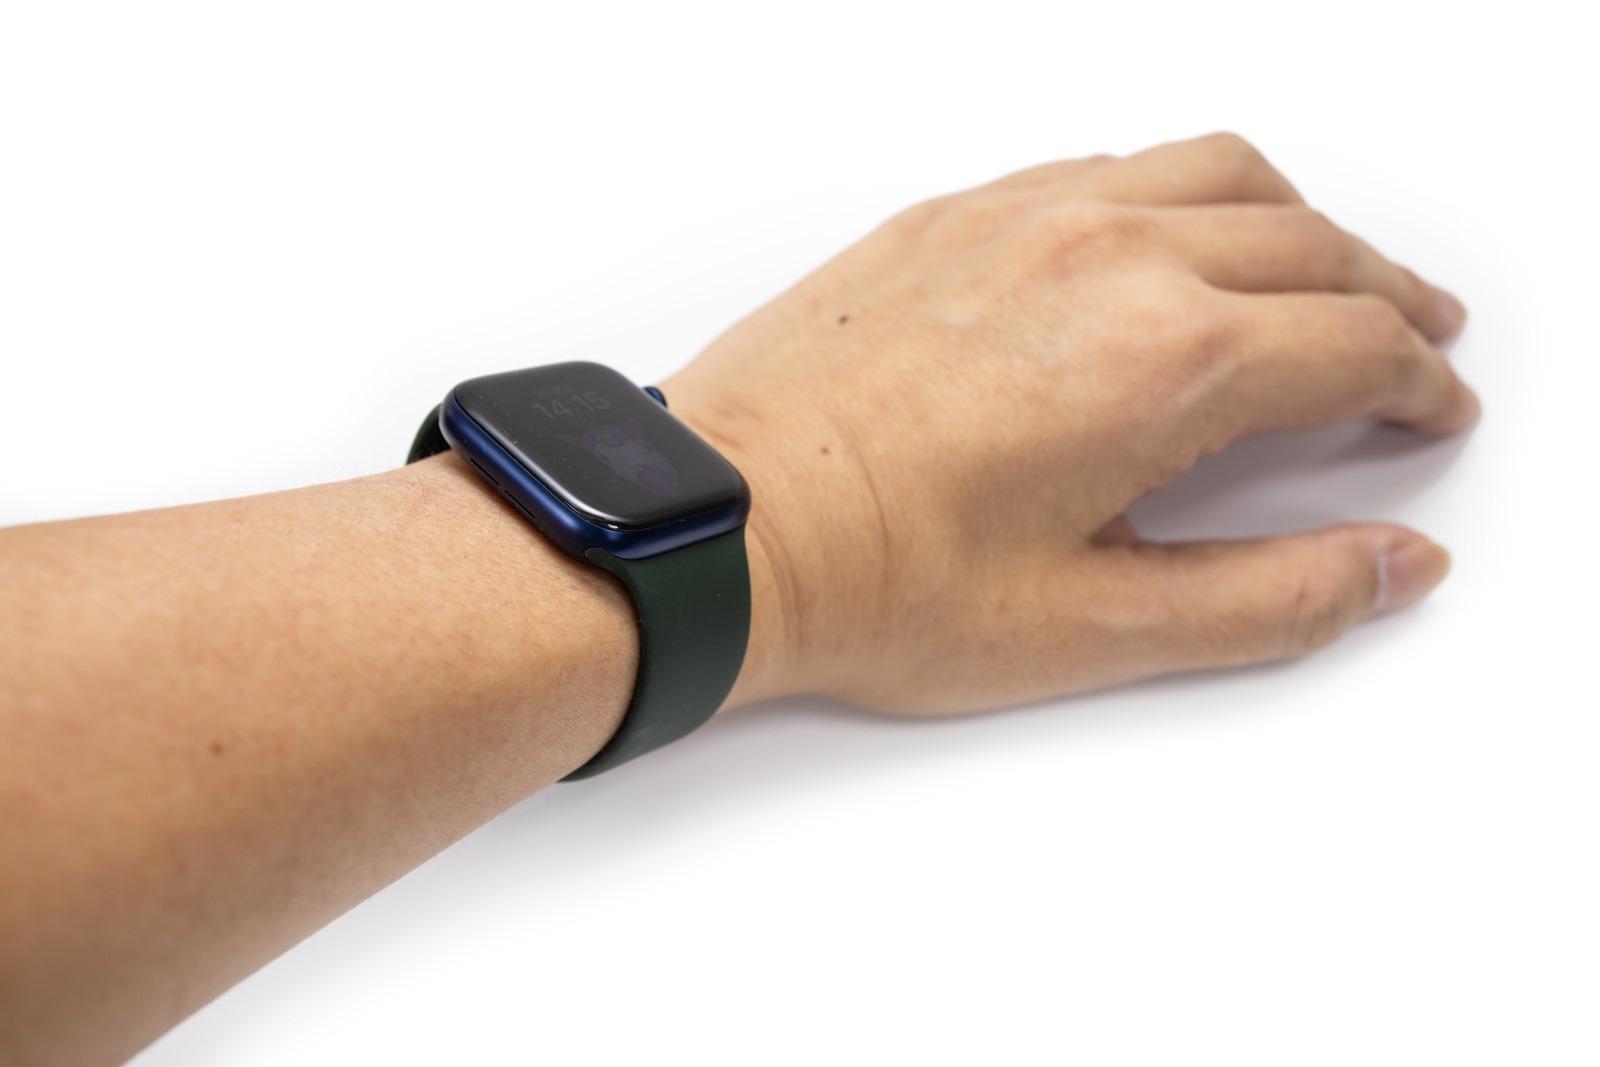 Apple Watch S6 (Serial 6) 開箱動手玩,看看盒中有什麼?( Apple Watch S6 unboxing) 也有單圈回環錶帶 & 單圈編織回環錶帶 @3C 達人廖阿輝